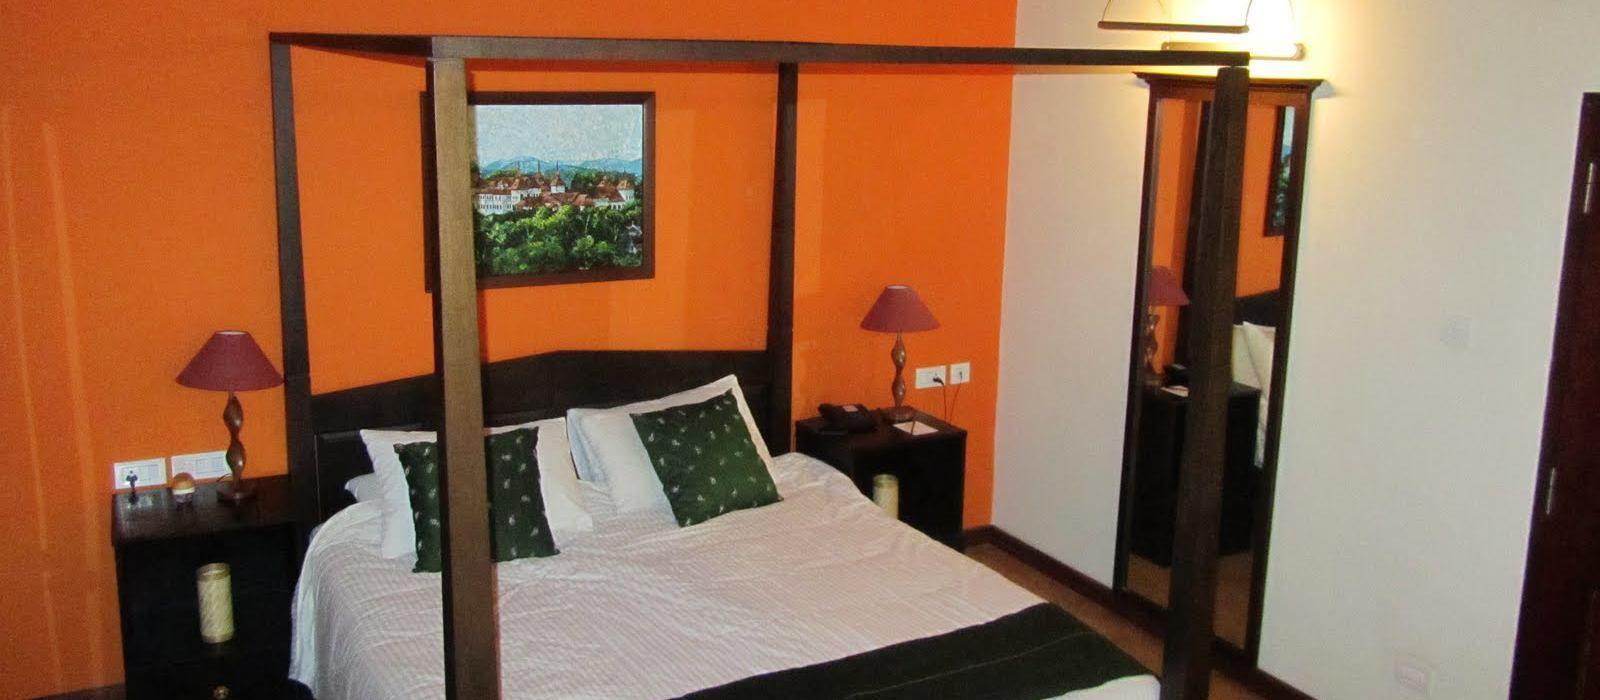 Hotel Tea Bungalow South India